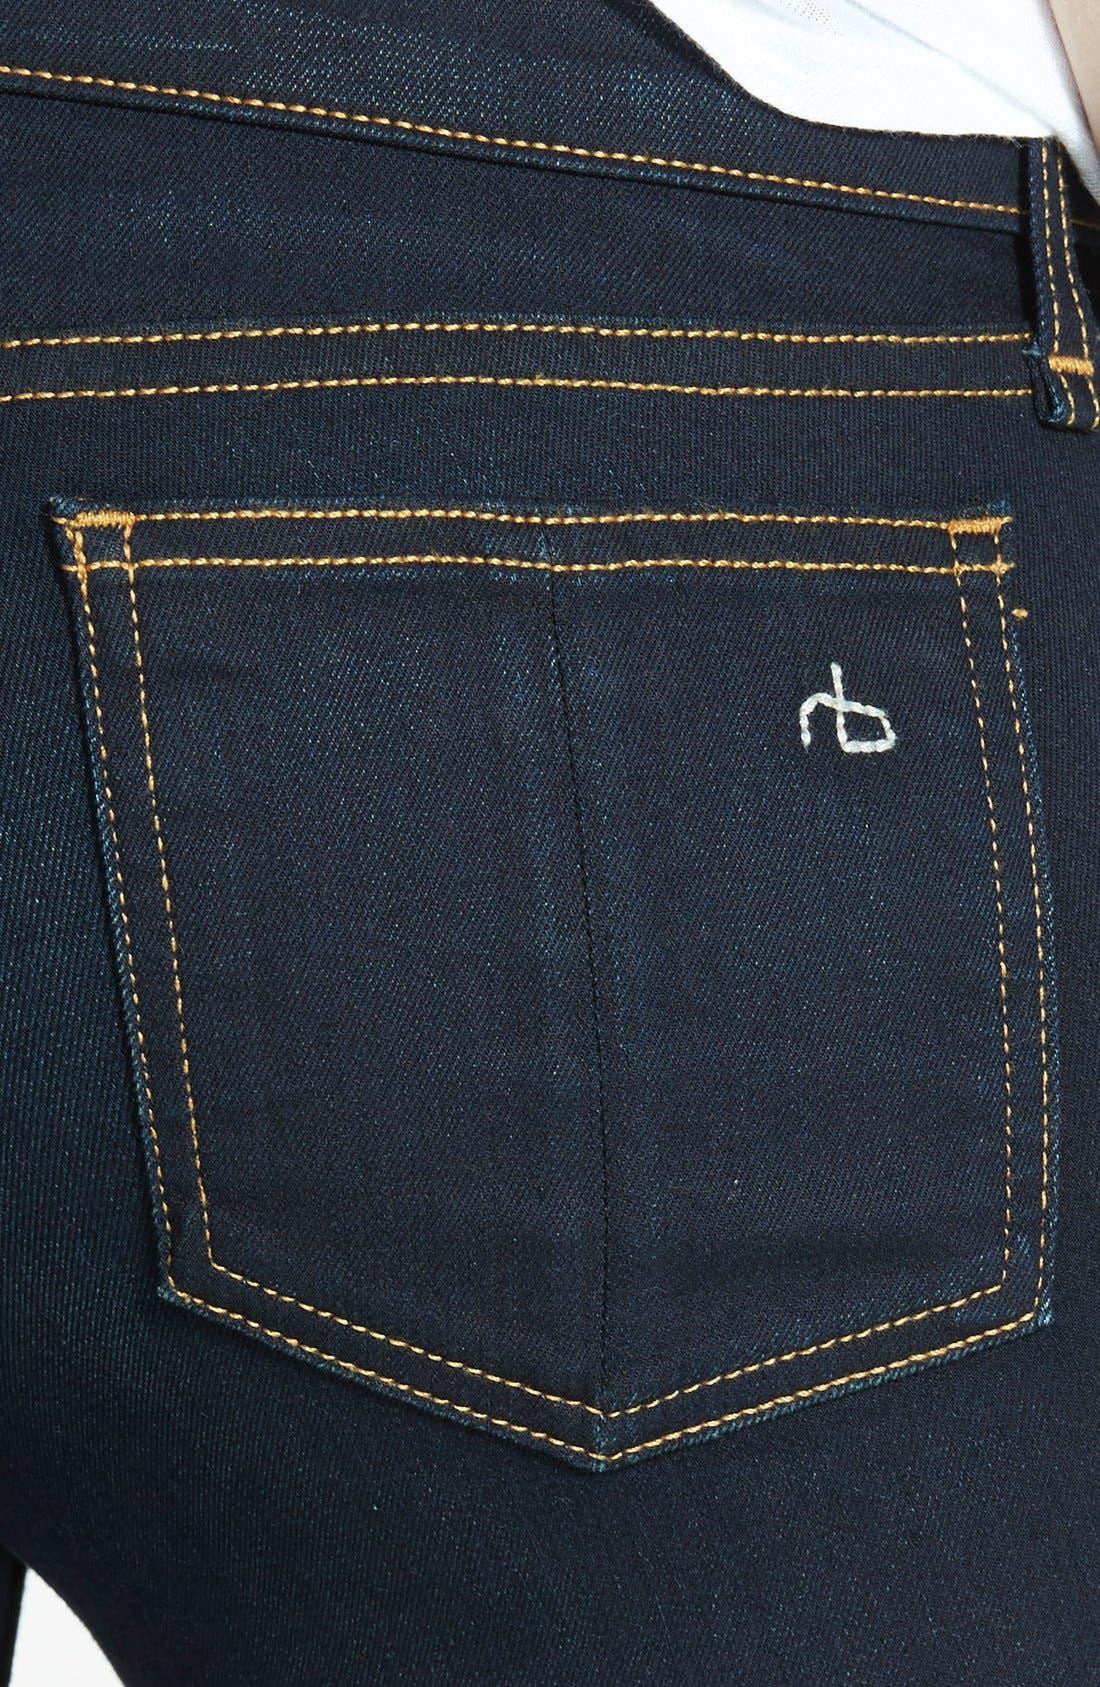 Alternate Image 3  - rag & bone/JEAN 'The Skinny' Mid Rise Jeans (Coventry)